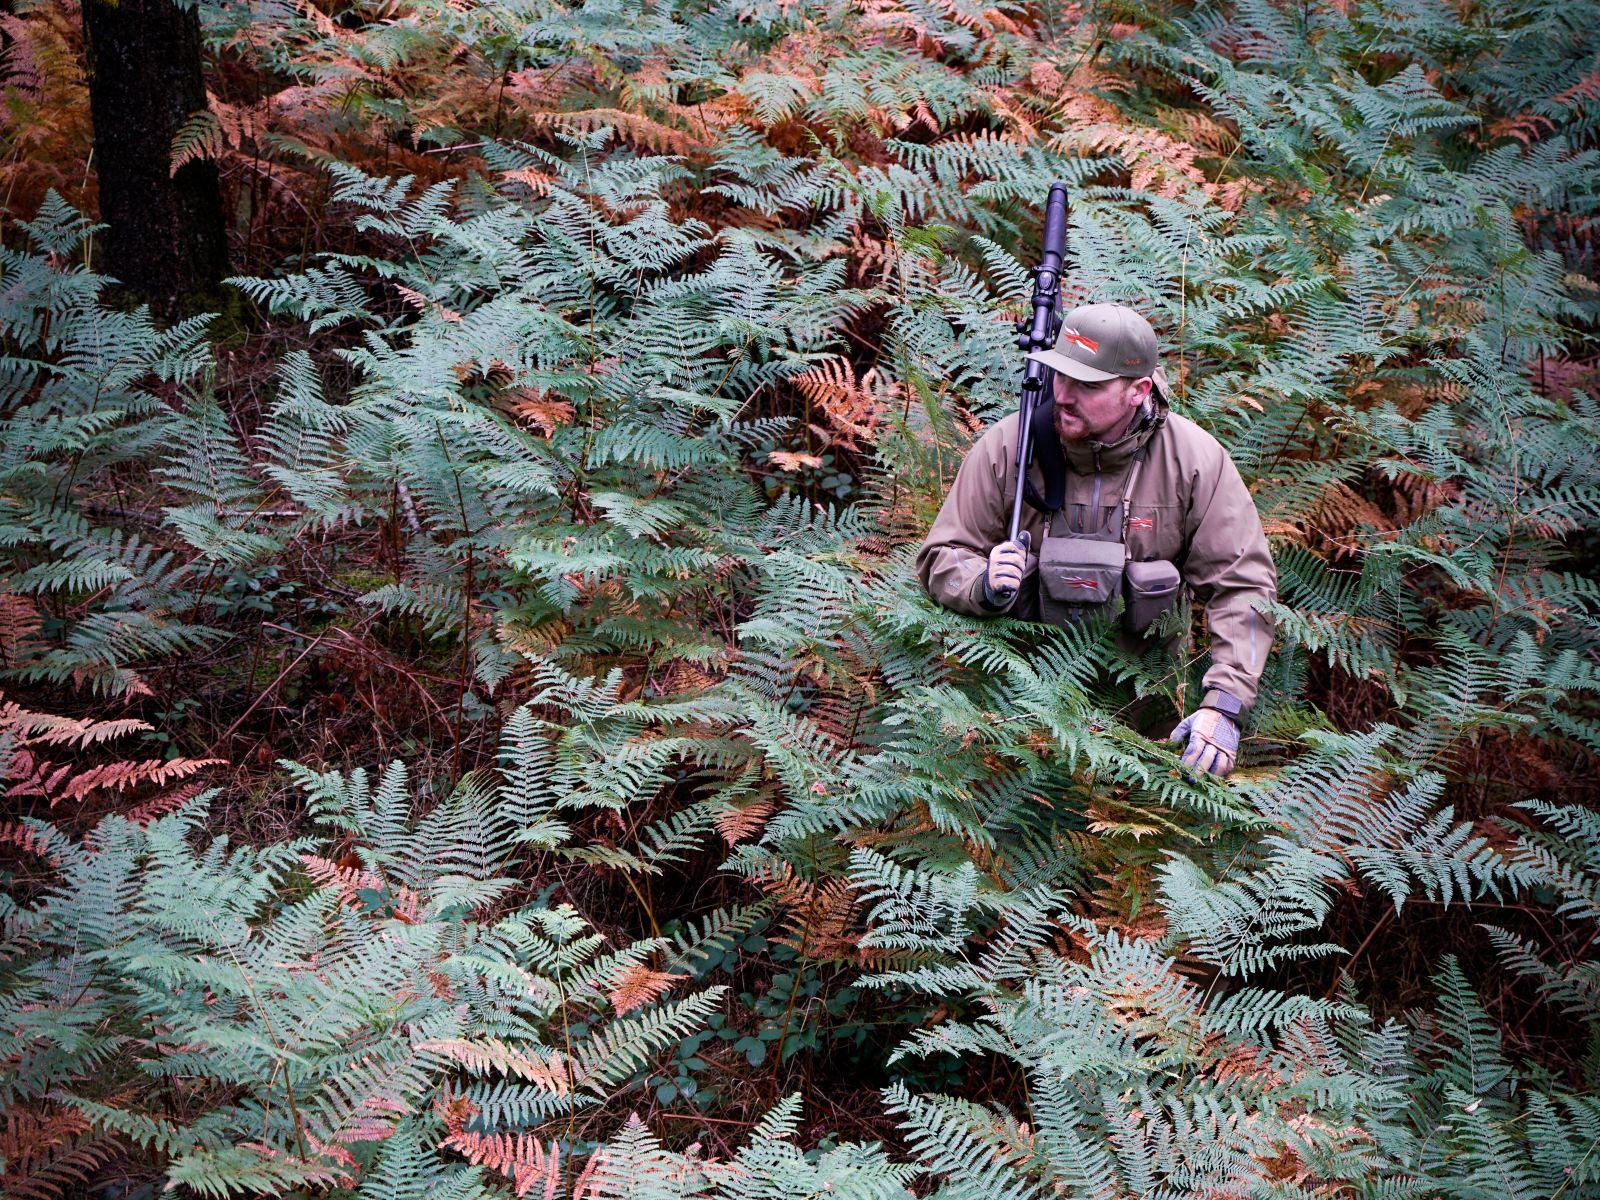 !!! Focussing on: Stefaan Rotthier, Belgian hunter H/